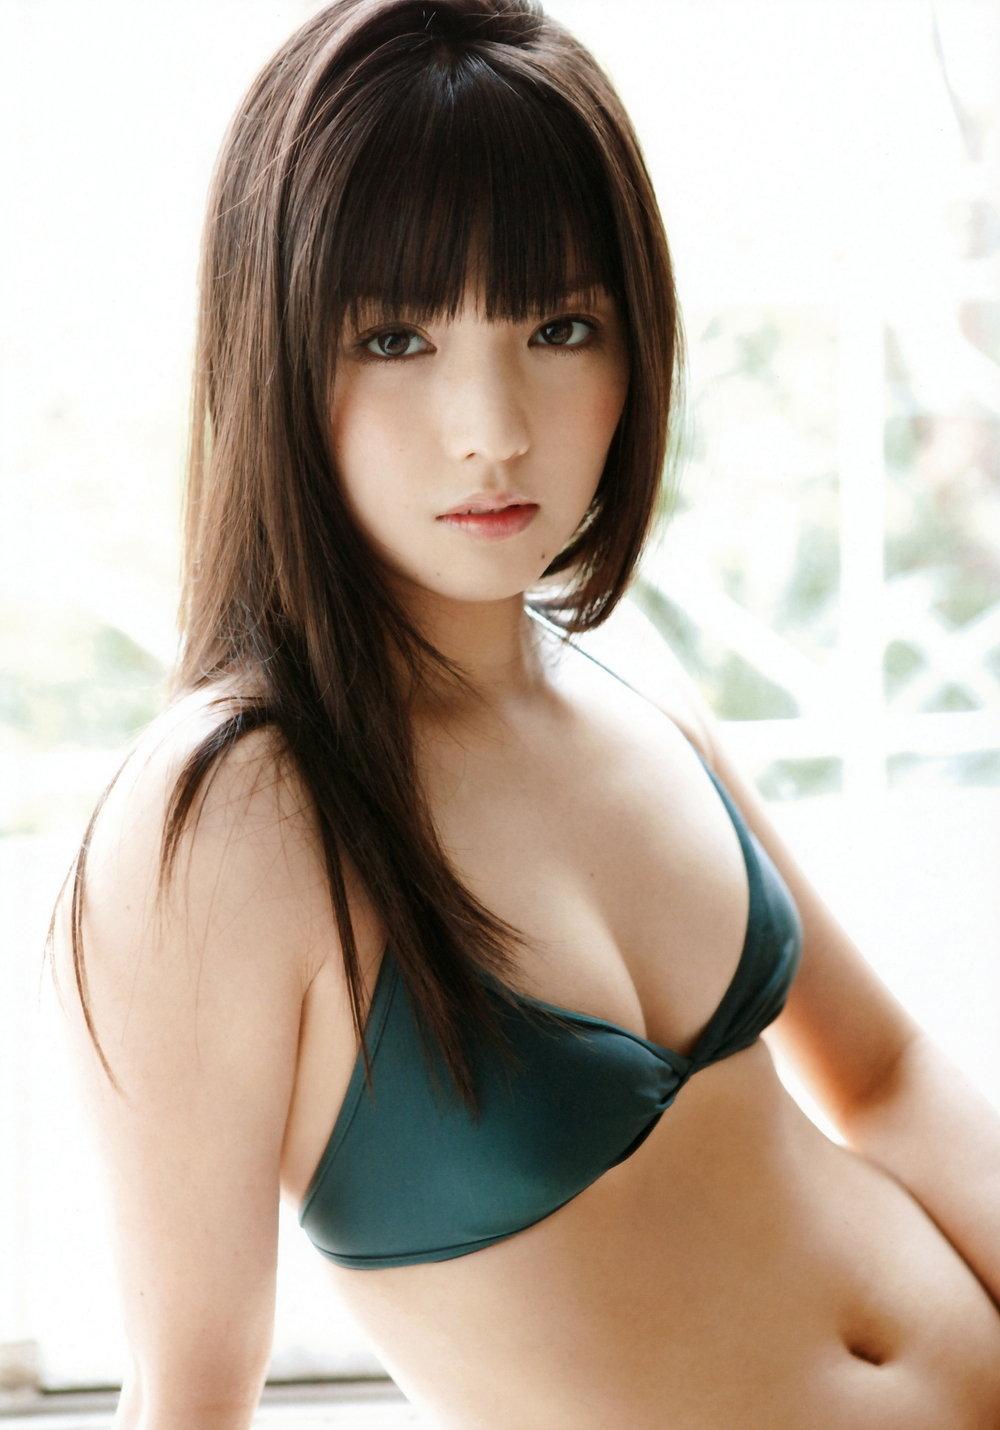 michishige sayumi mille feuille photobook previews morningtime